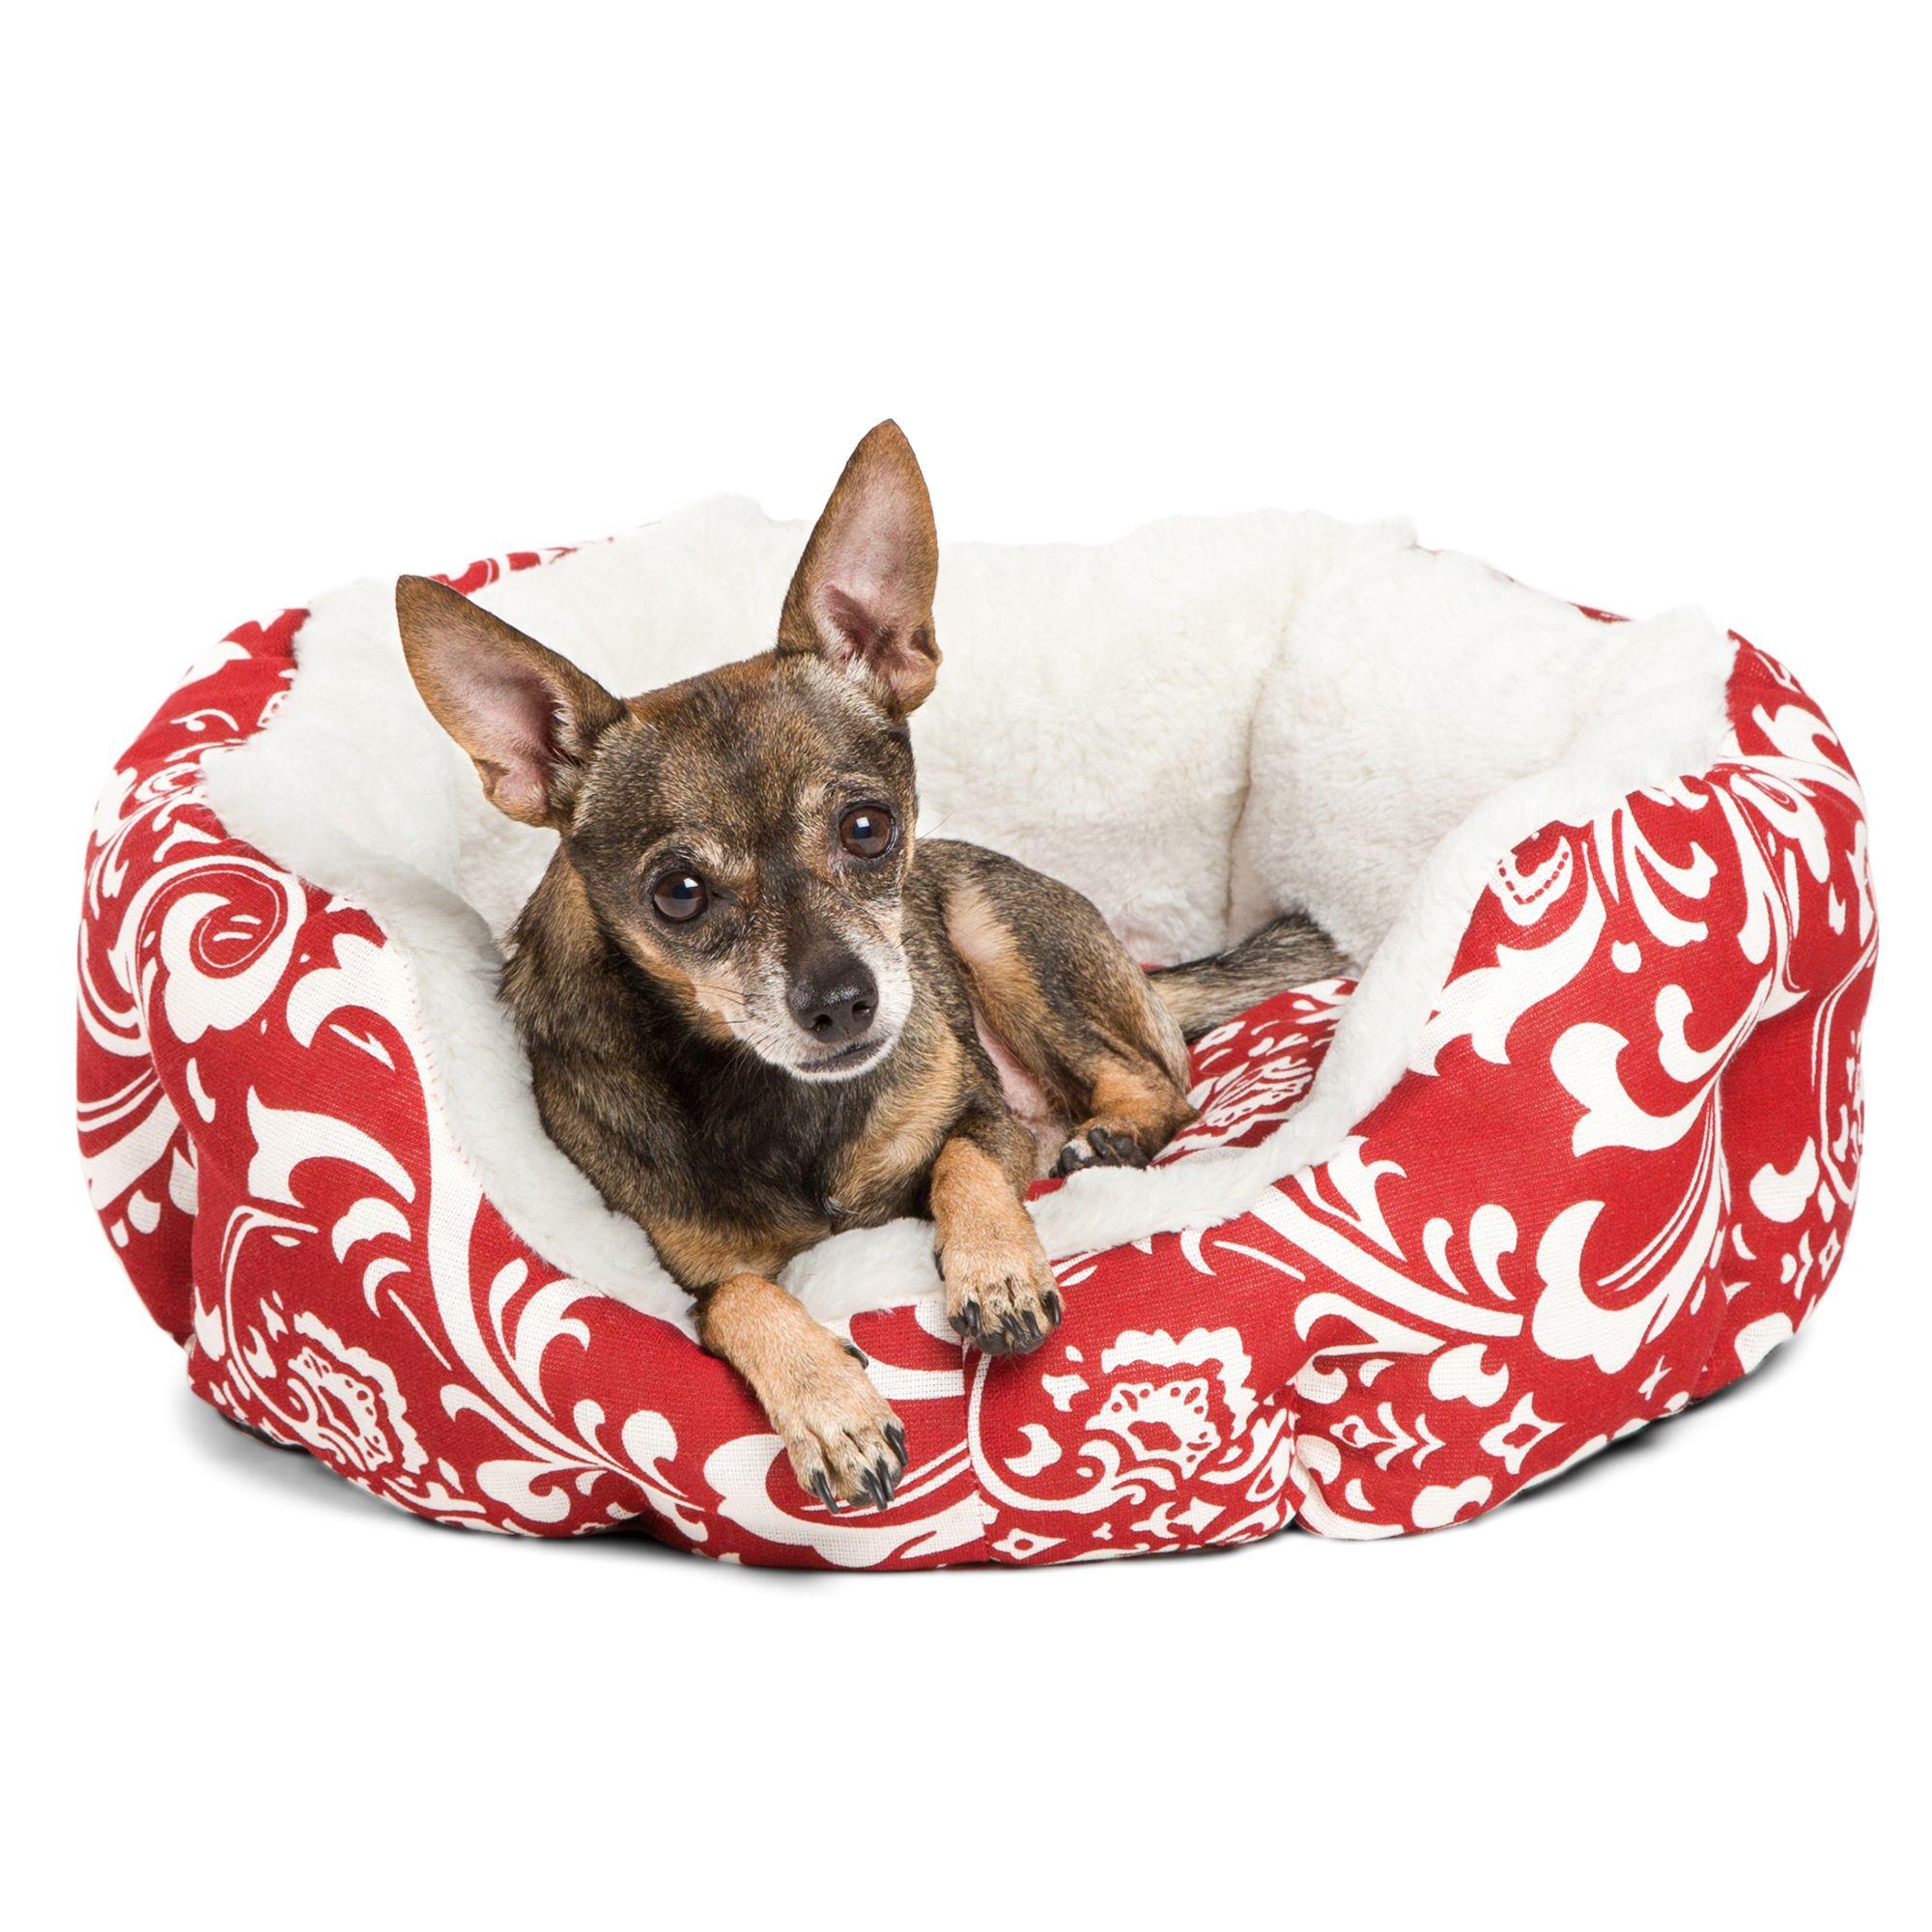 Best Friends By Sheri Cuddler Pet Bed Size 16l X 16w X 6h Red